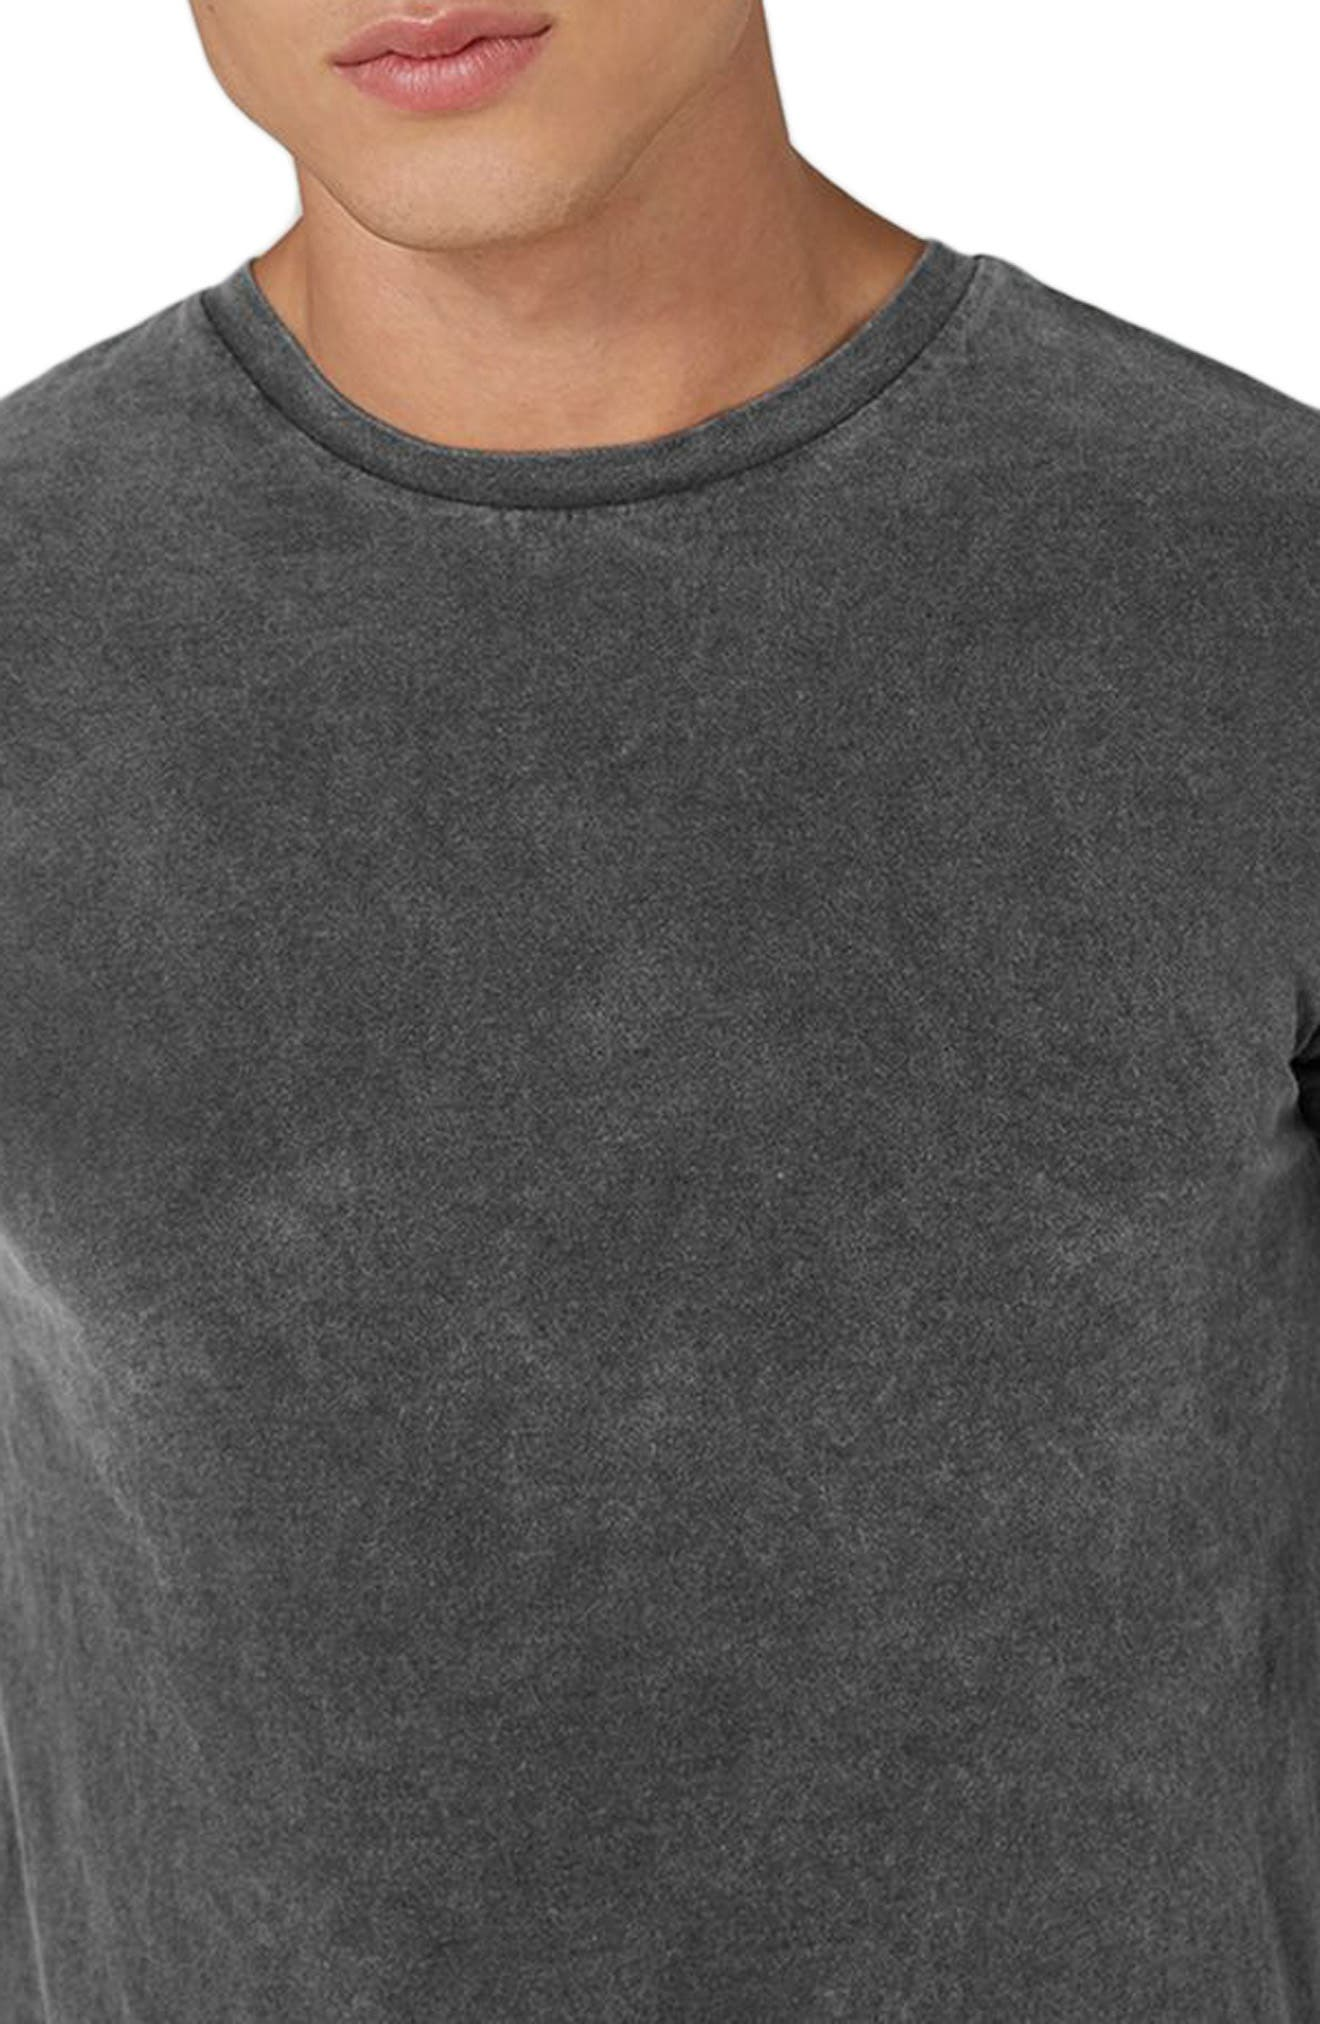 Acid Wash Classic Fit T-Shirt,                             Alternate thumbnail 3, color,                             Black